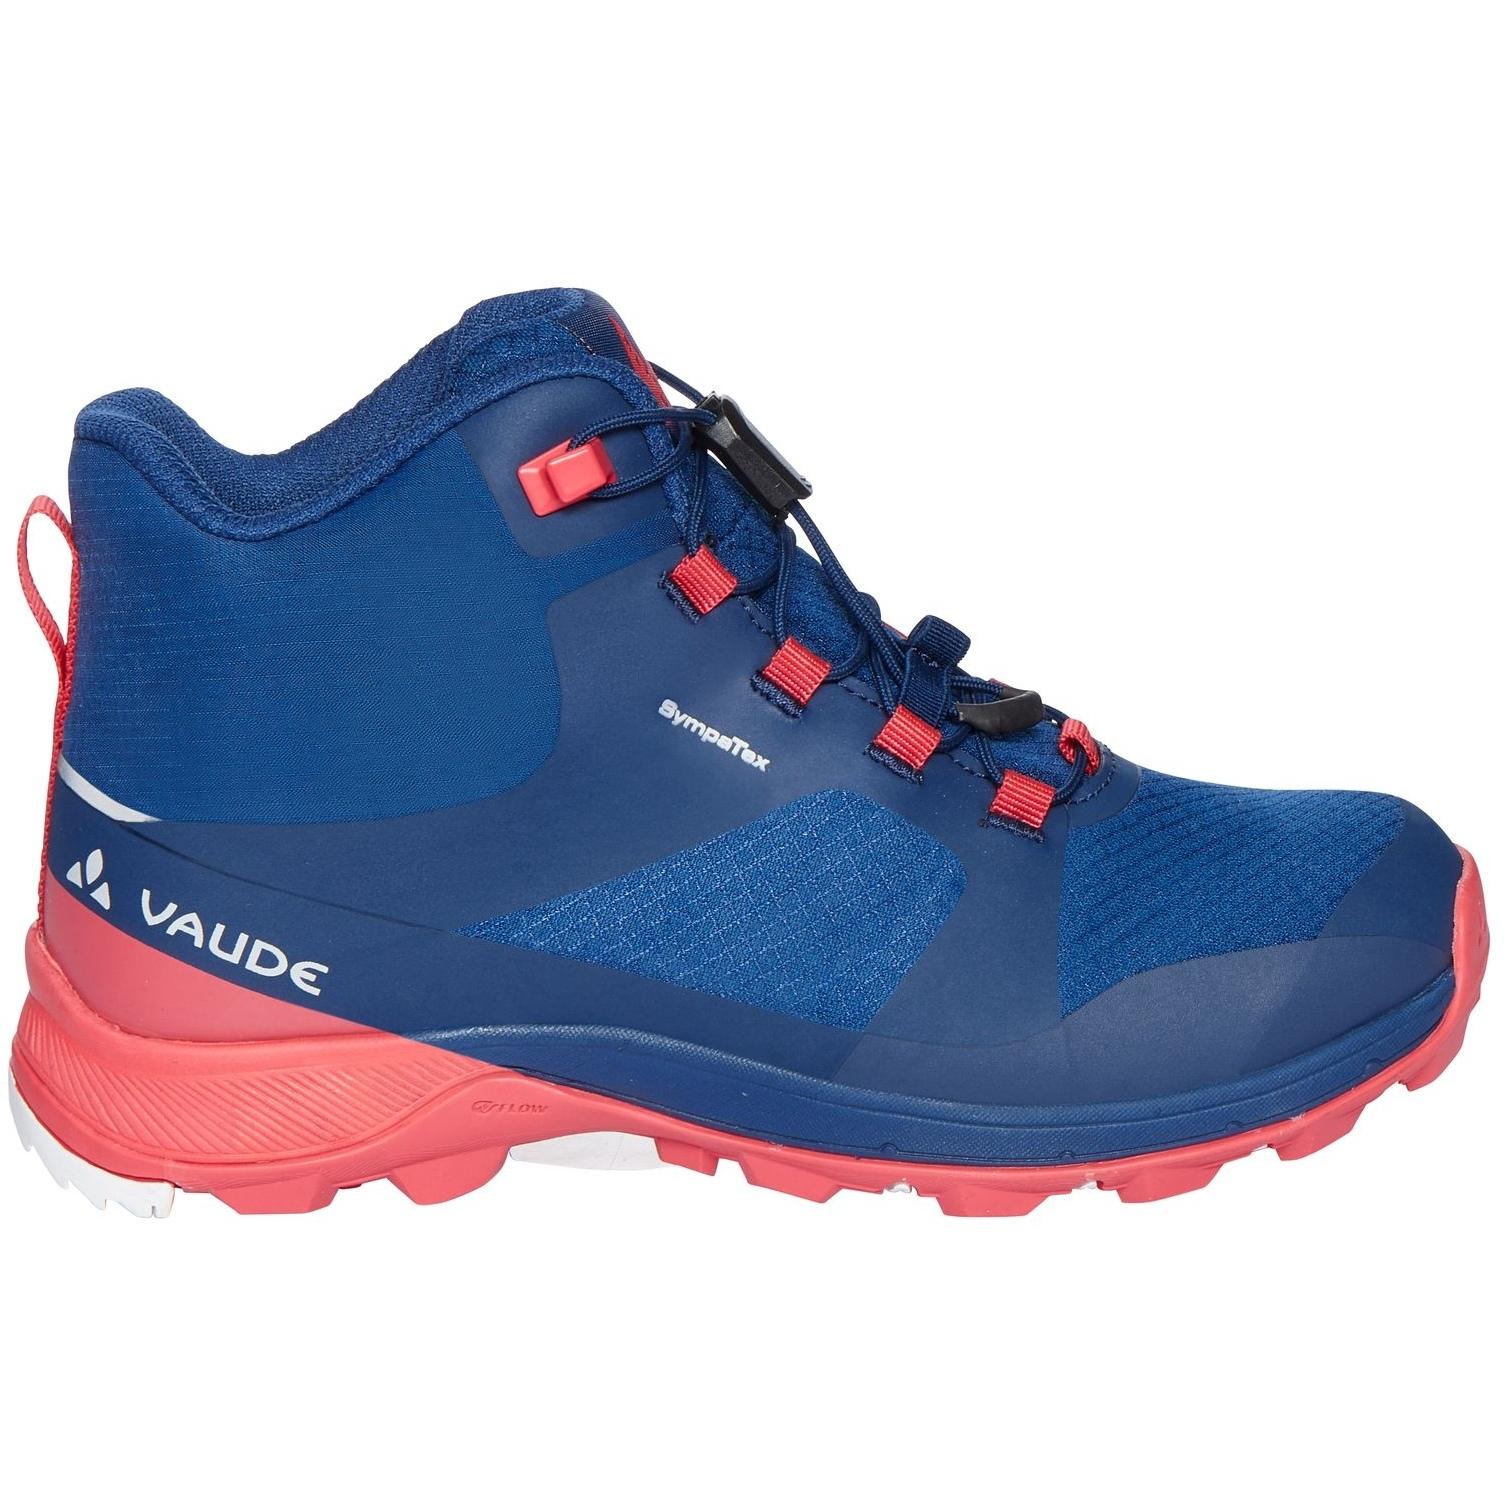 Vaude Kids Lapita II Mid STX Schuhe - bright pink